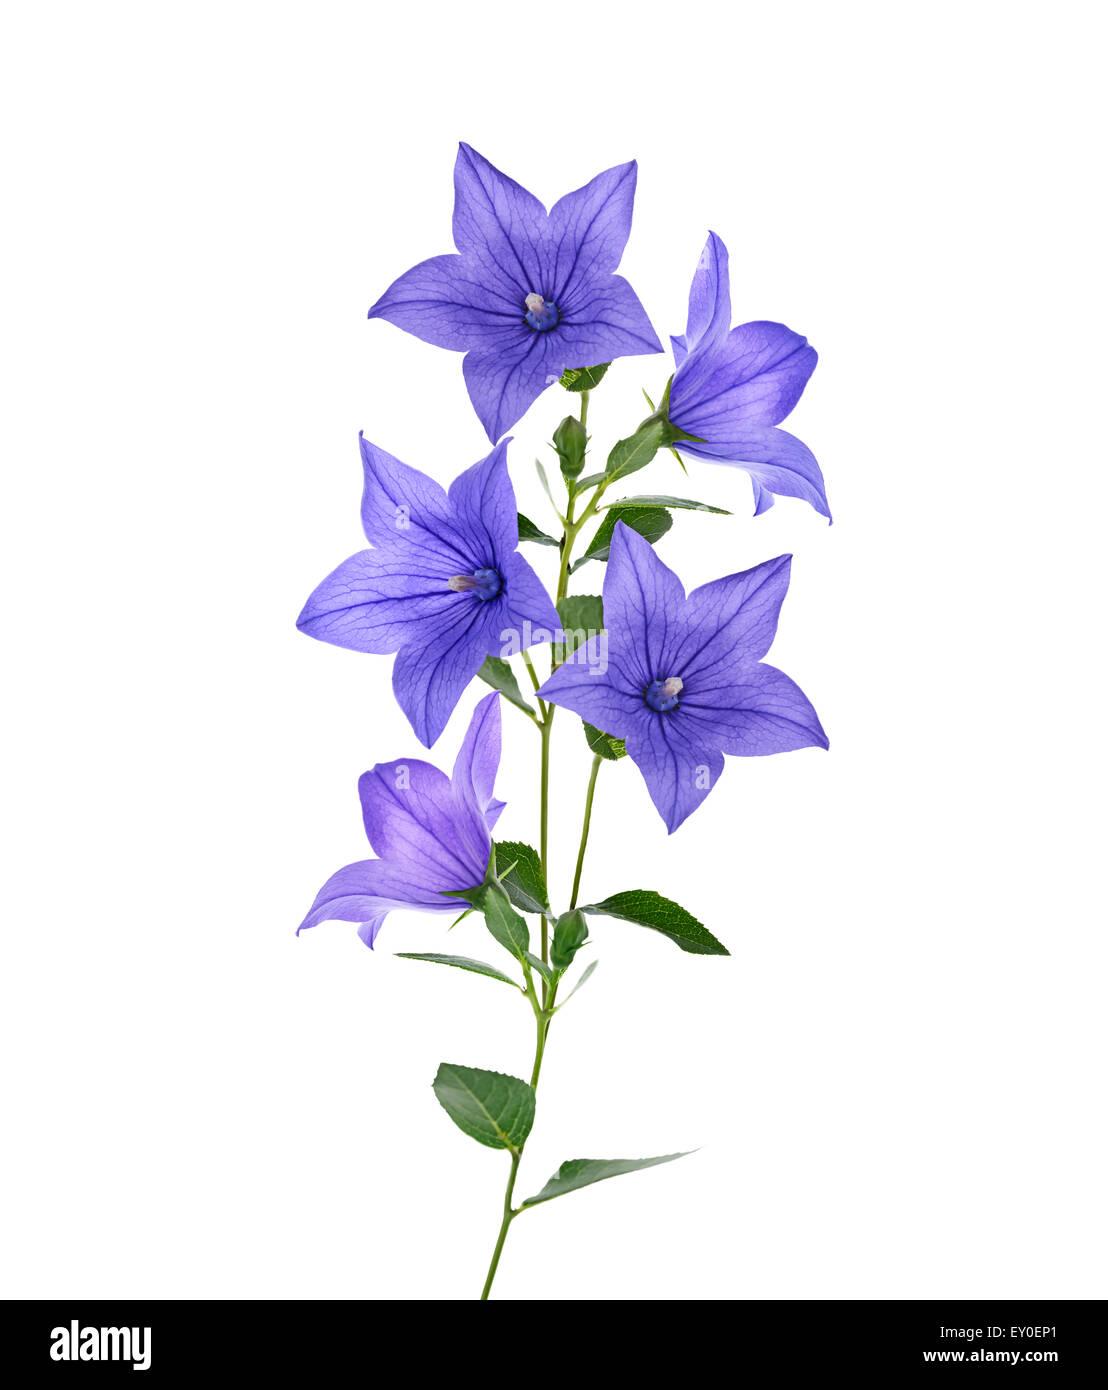 Blue bell flowers isolated on white background stock photo royalty blue bell flowers isolated on white background mightylinksfo Choice Image